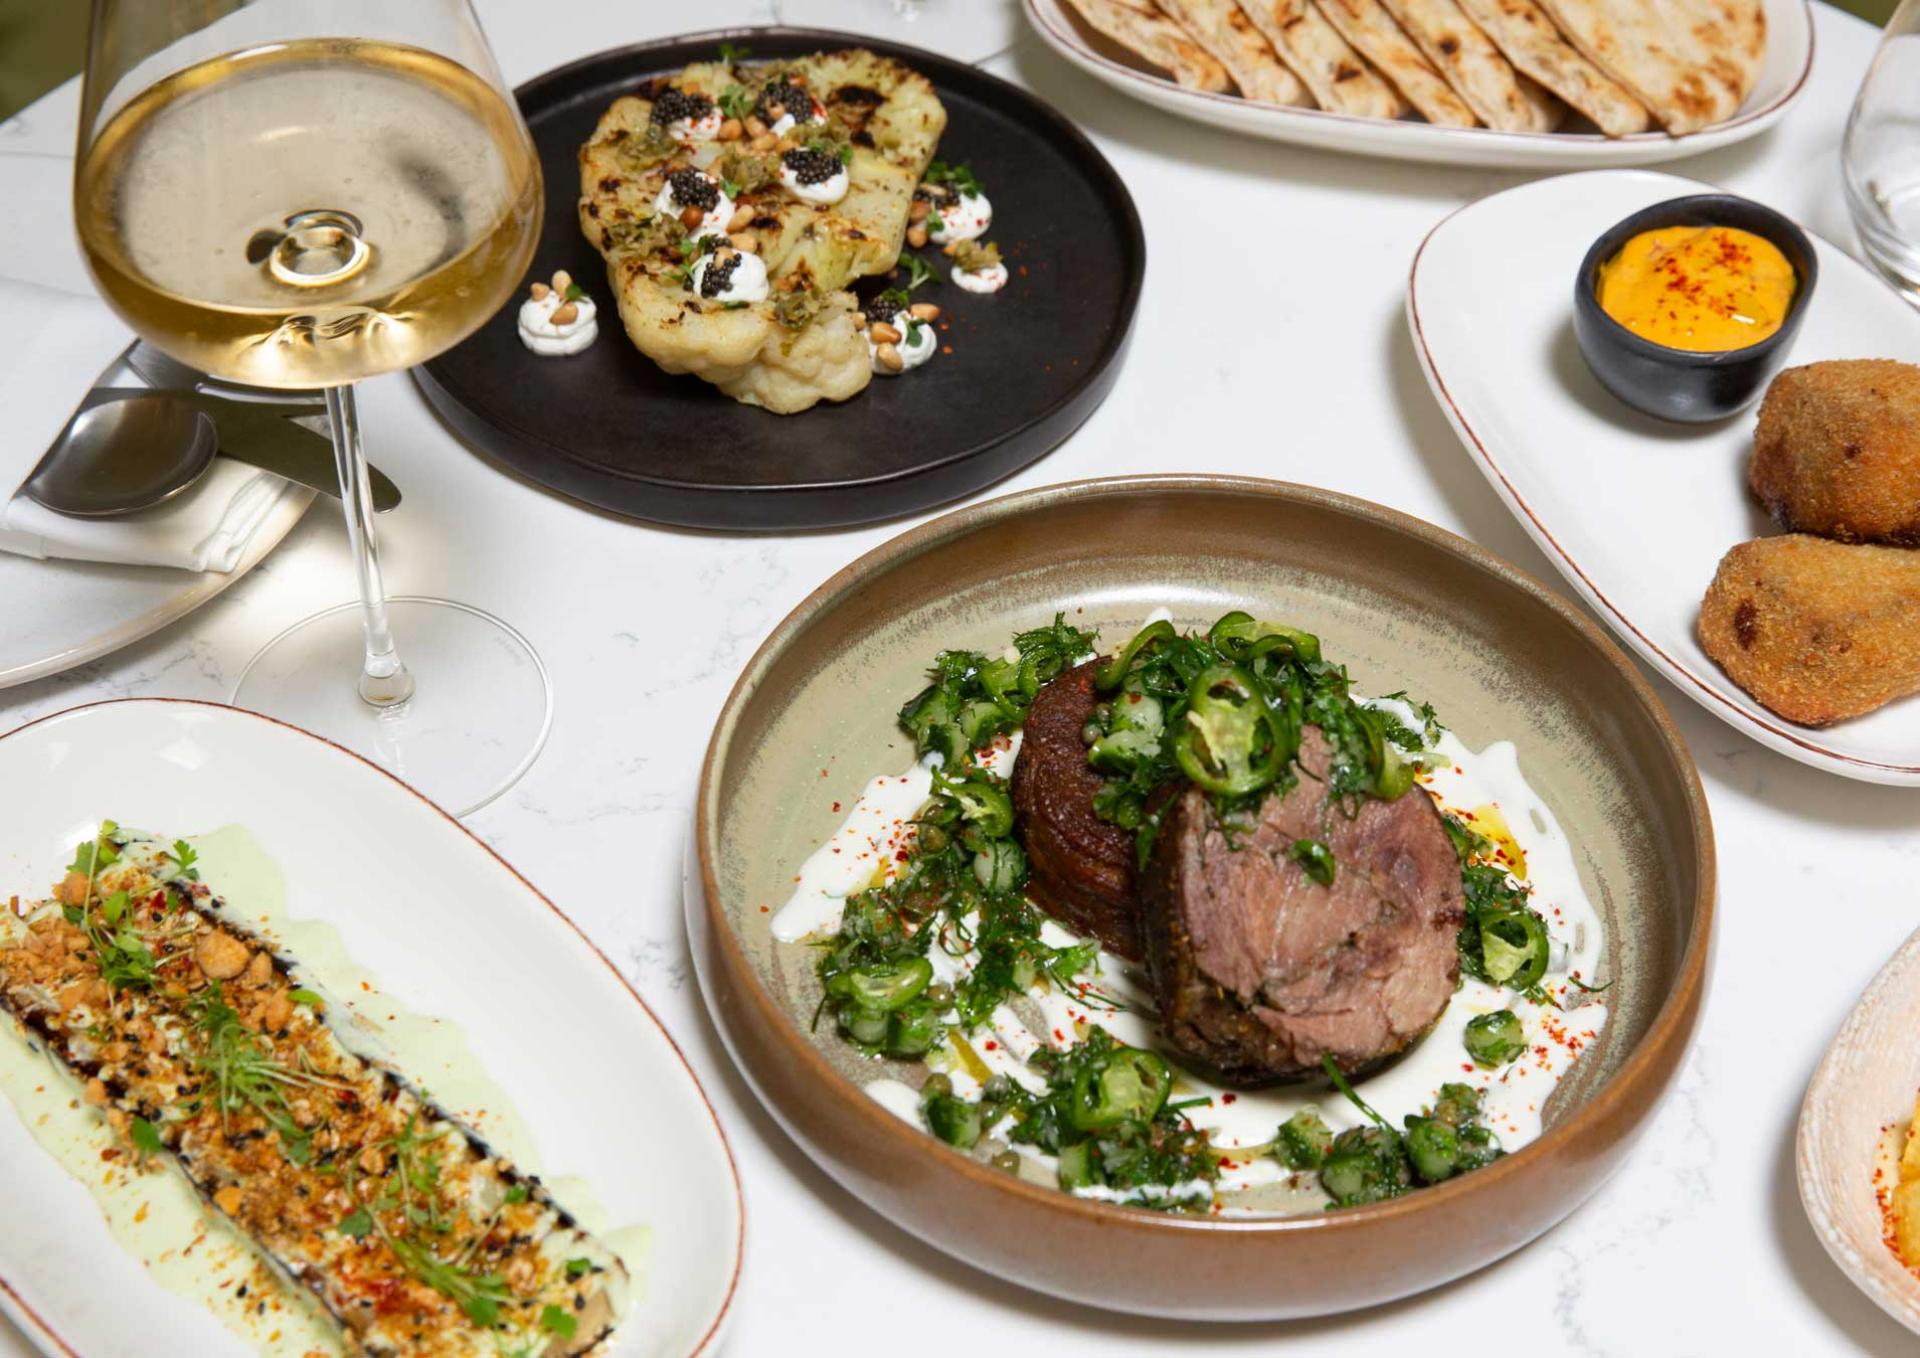 Restaurant meal kits: Ampeli